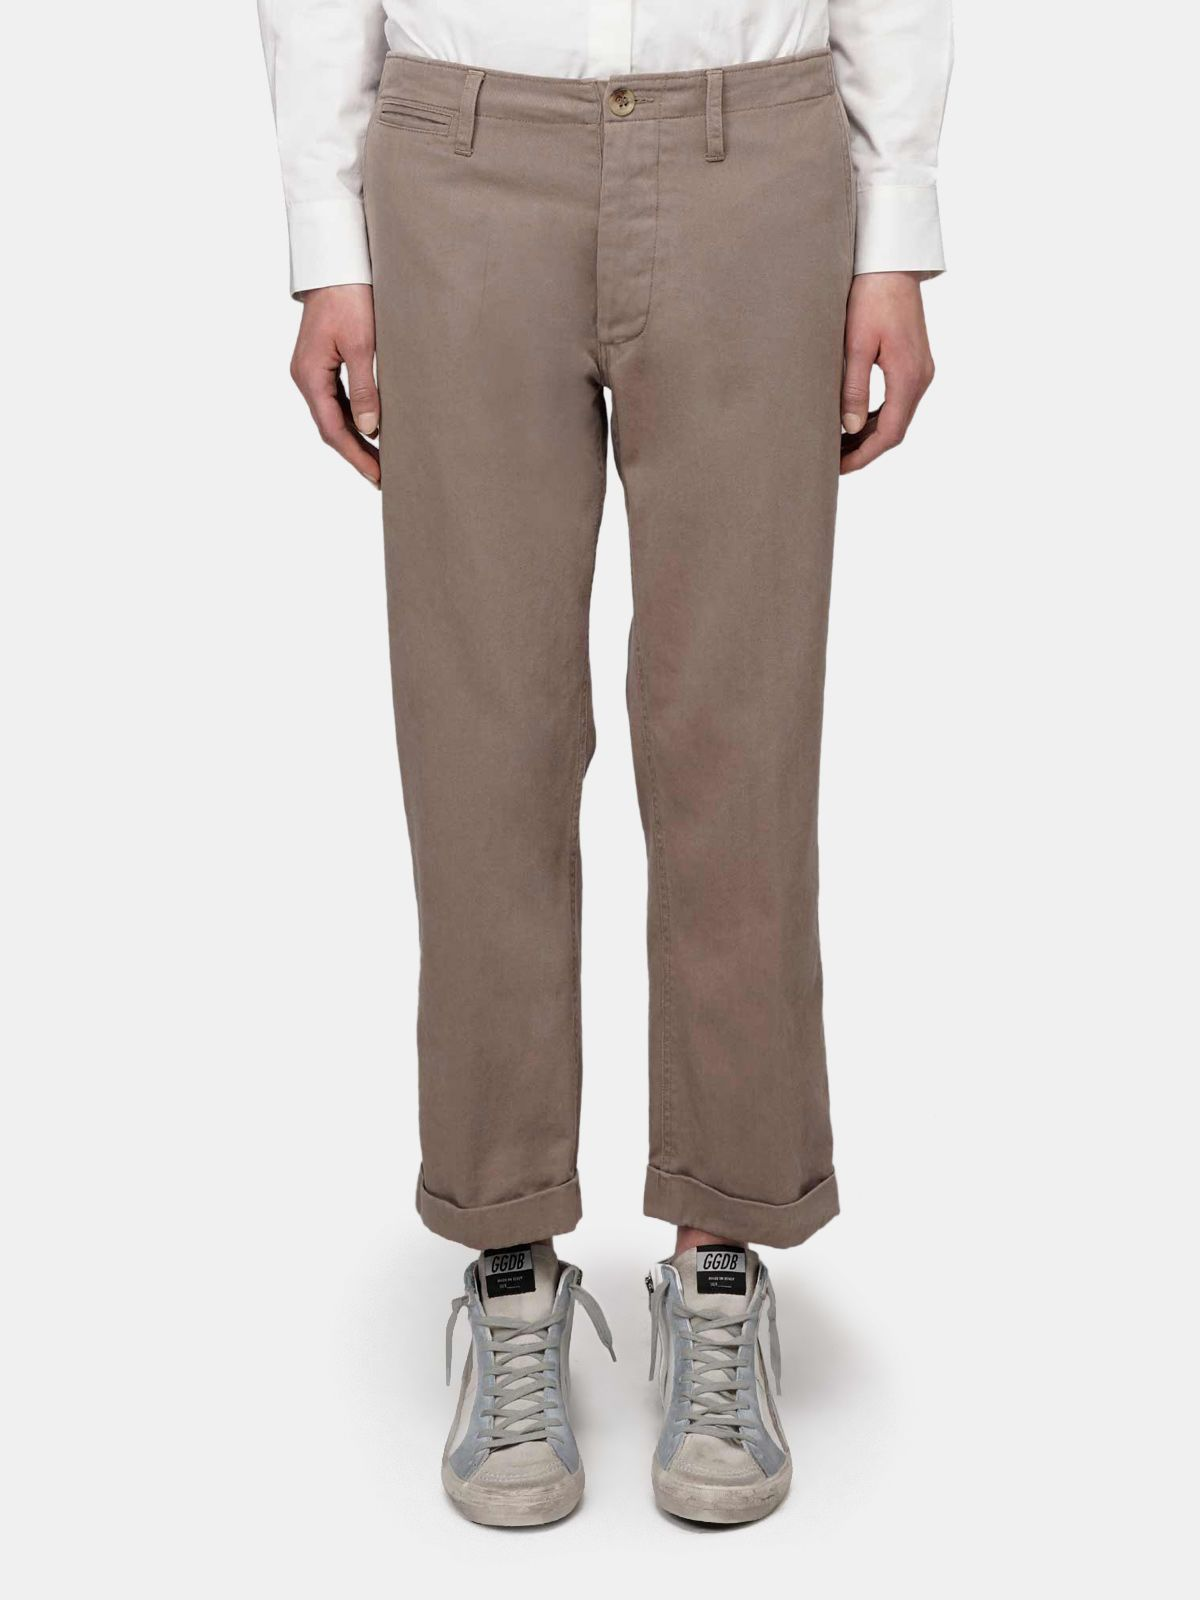 Golden Goose - Megan chino trousers in khaki in